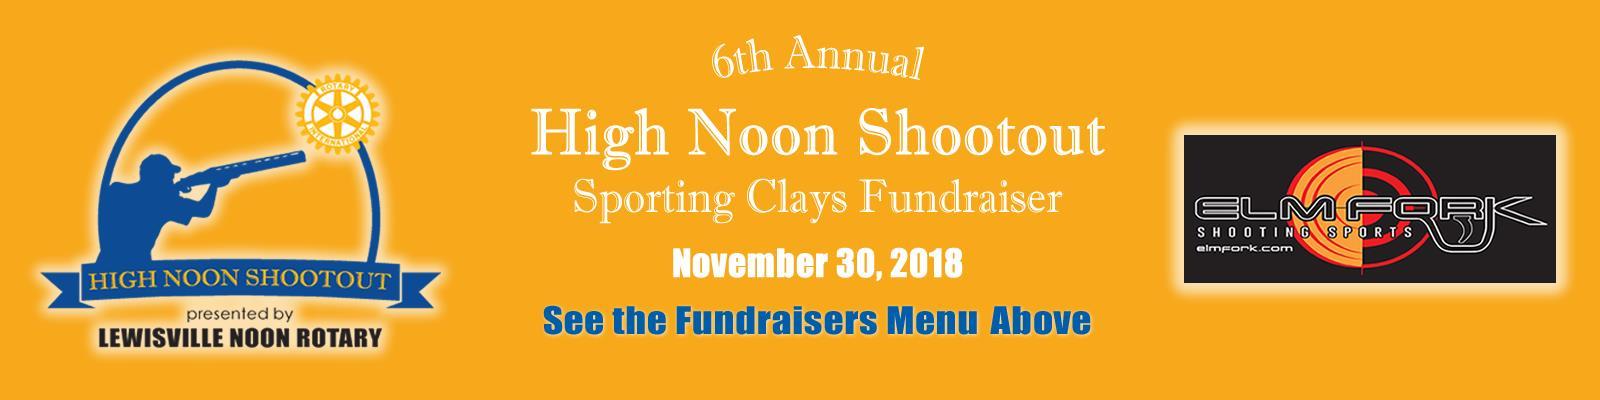 High Noon Shootout Fundraiser at Elm Fork